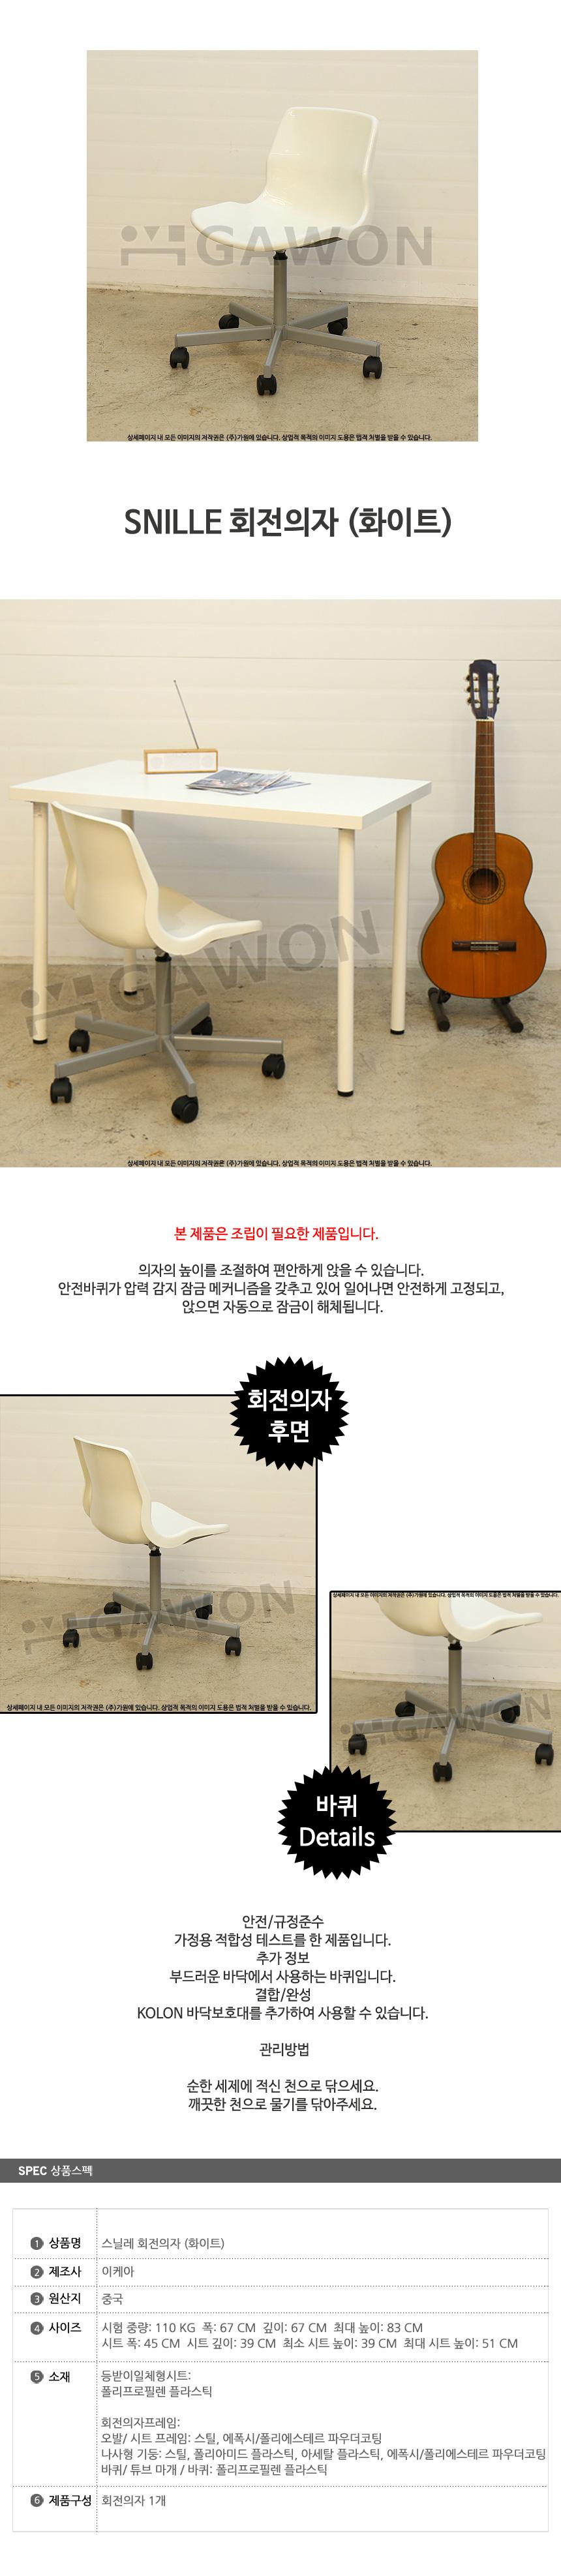 SNILLE 회전의자 - 이케아, 57,100원, 책상/의자, 오피스 의자